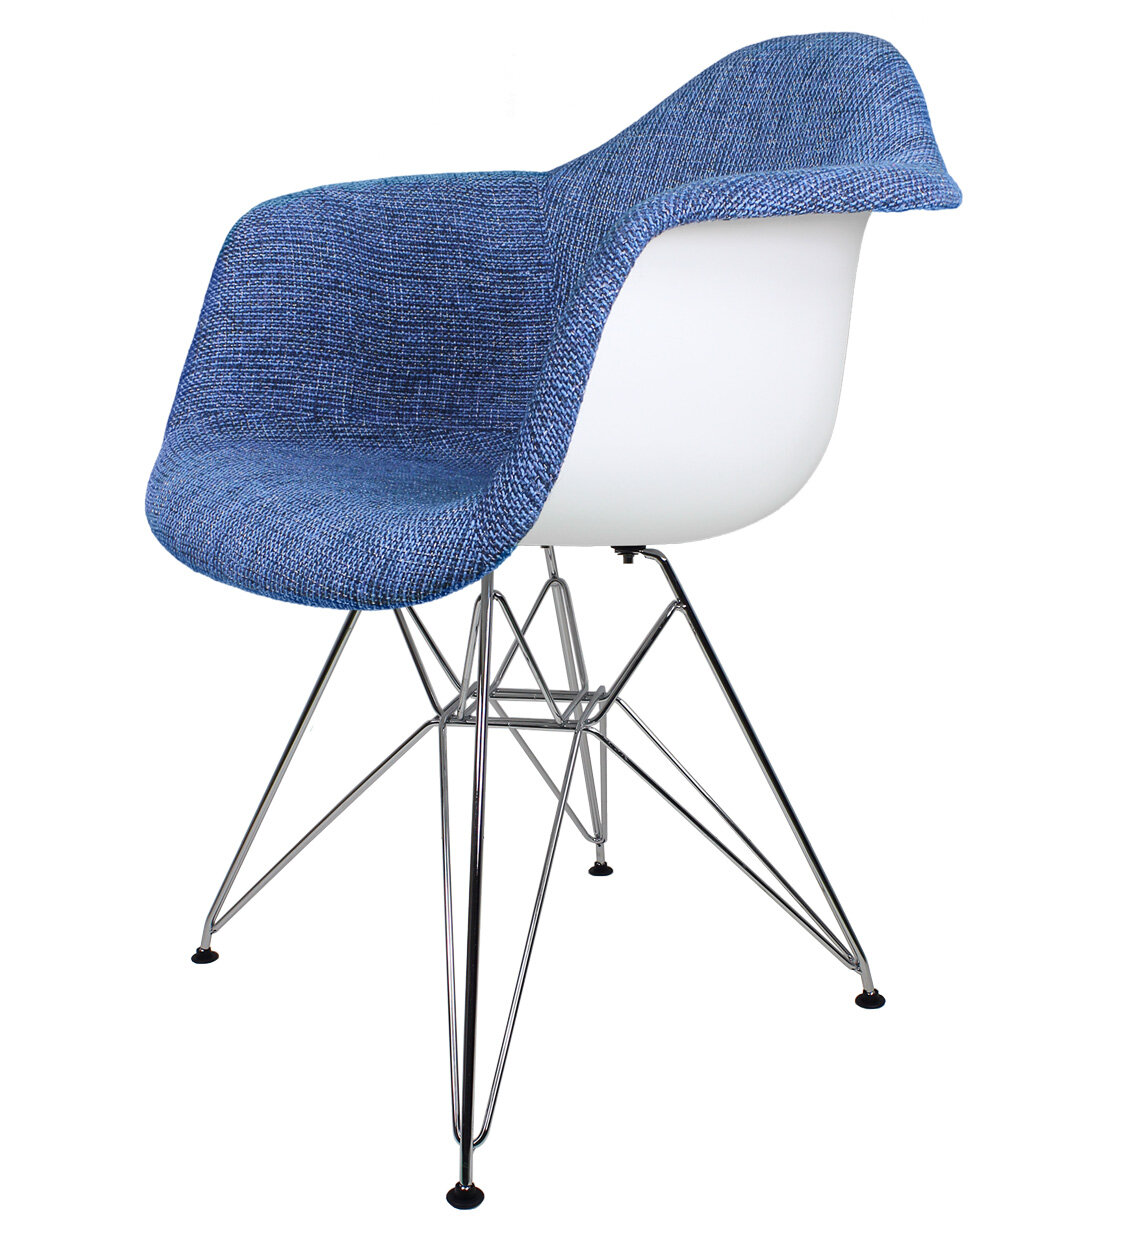 Astounding Siloam Armchair Cjindustries Chair Design For Home Cjindustriesco